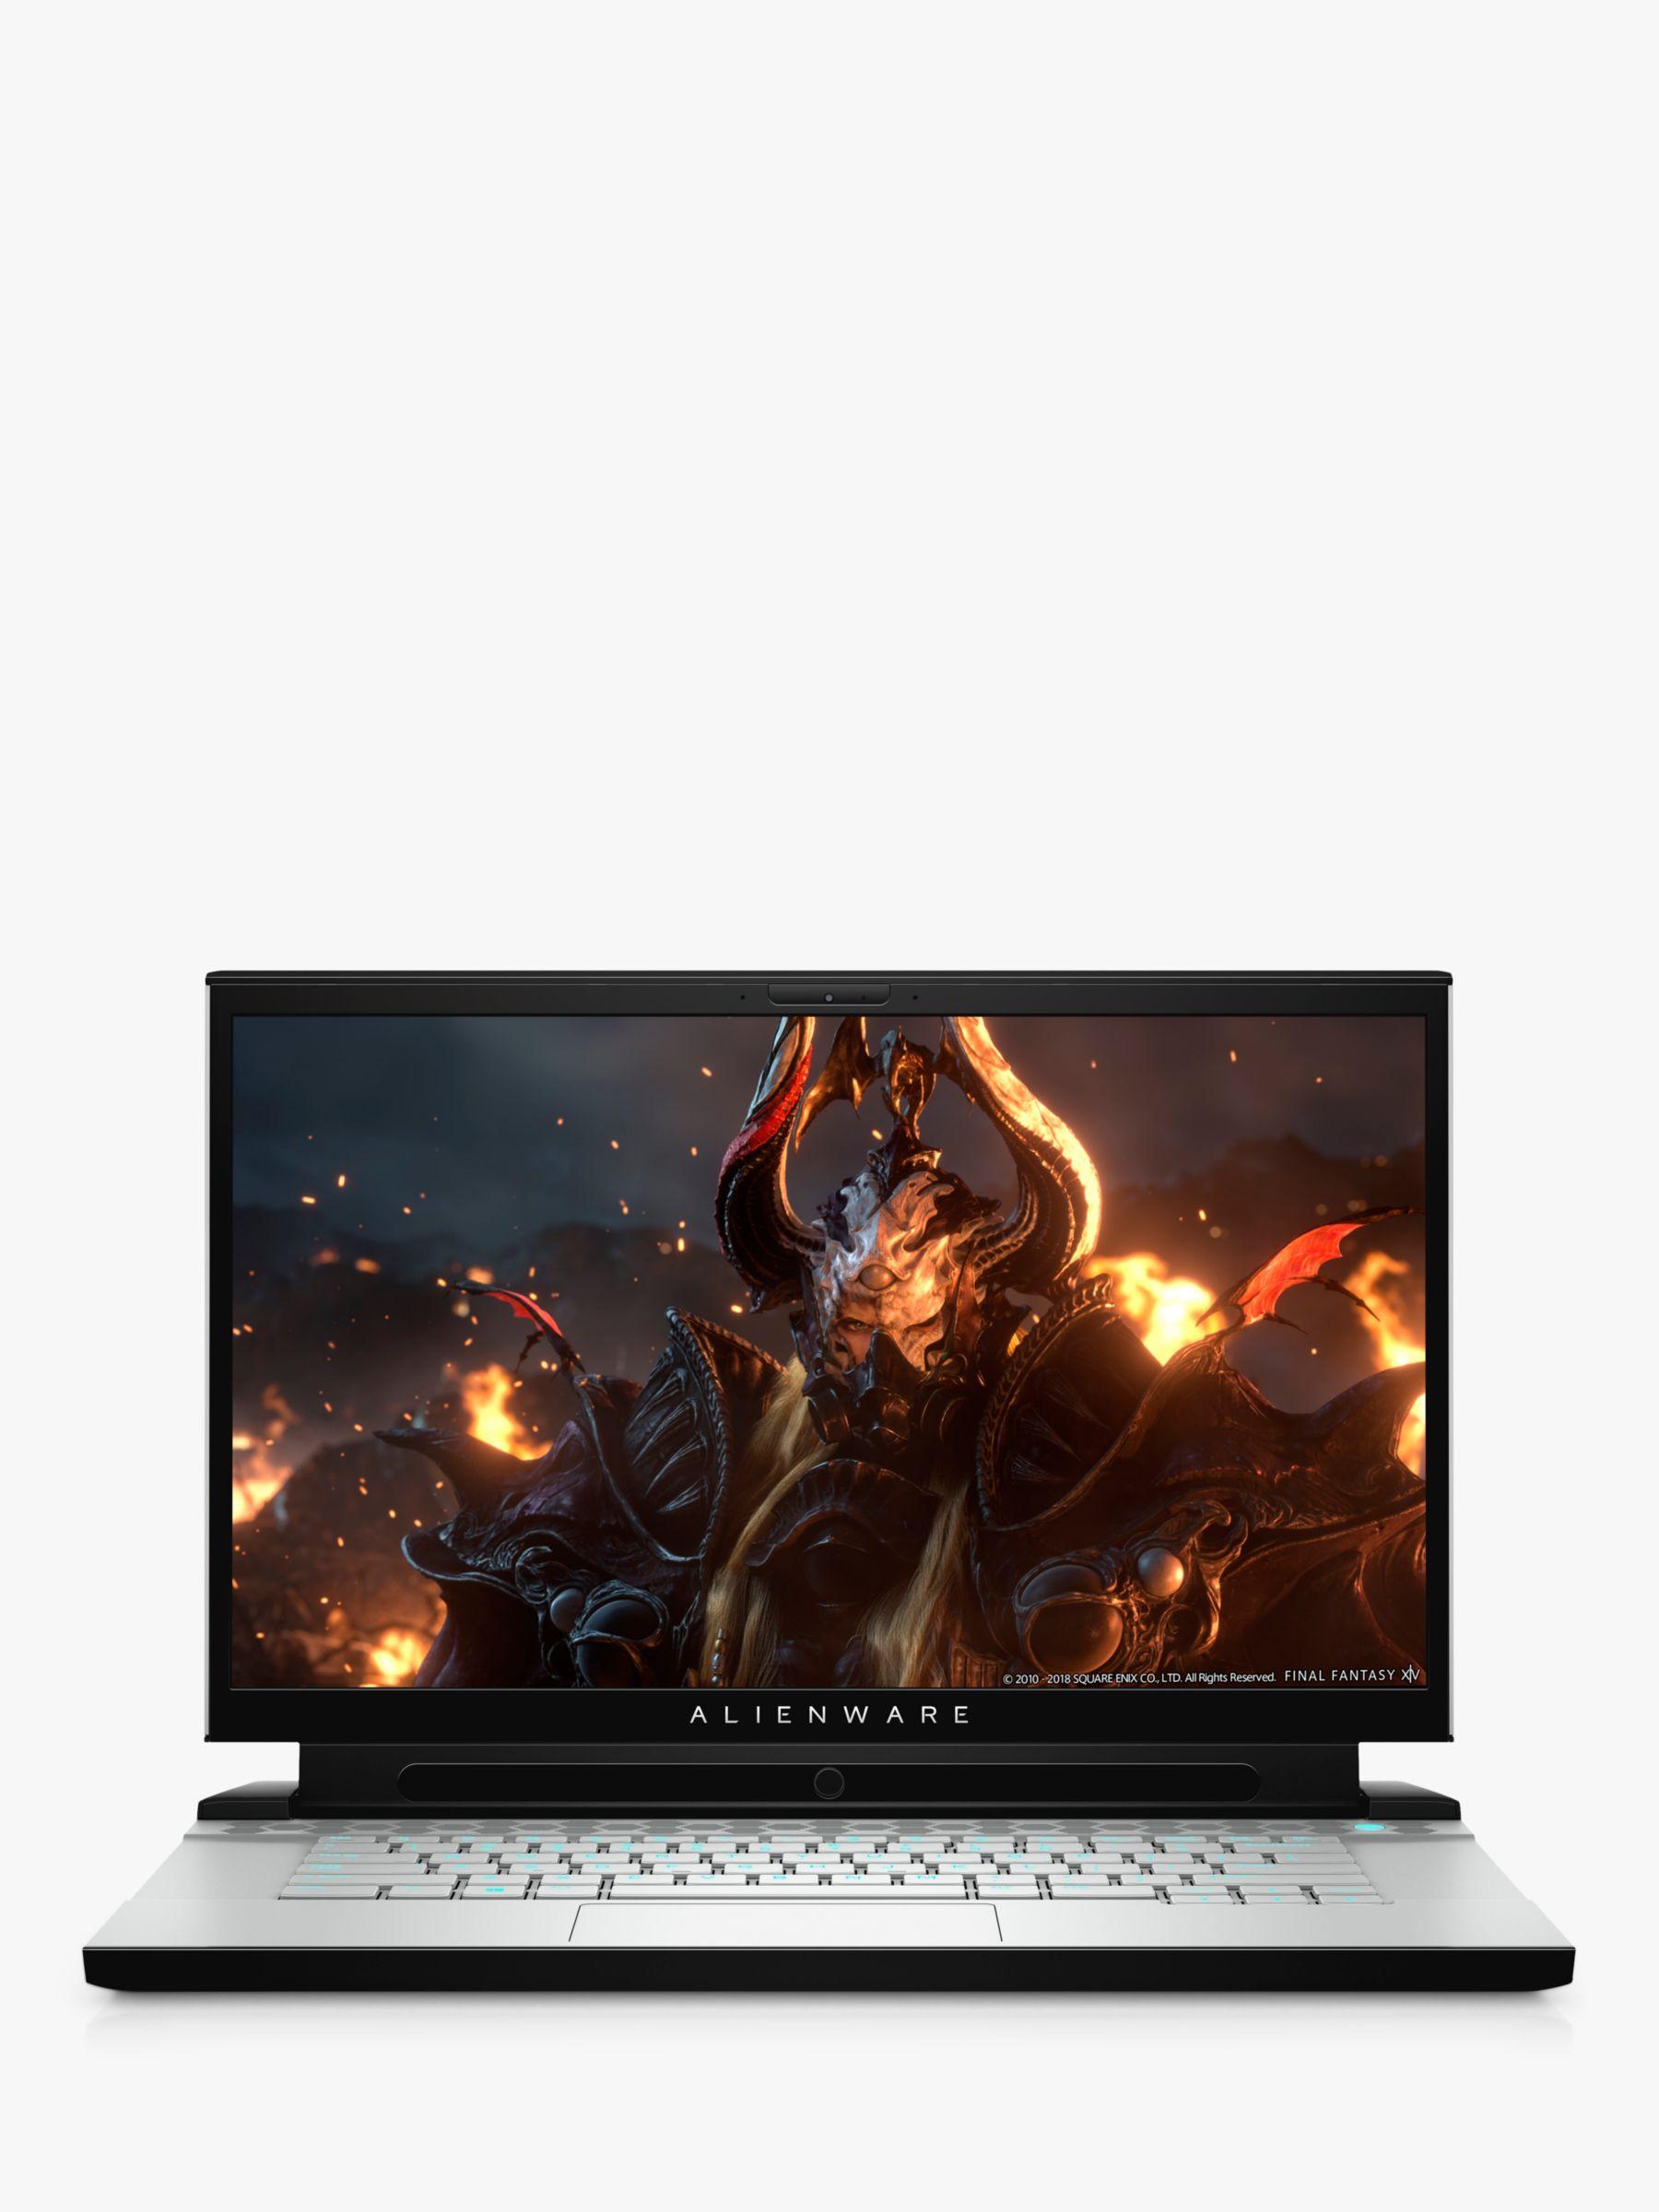 Alienware m15 R2 D-85589 Gaming Laptop, Intel Core i7 Processor, 16GB RAM,  1TB SSD, GeForce RTX 2070, 15 6